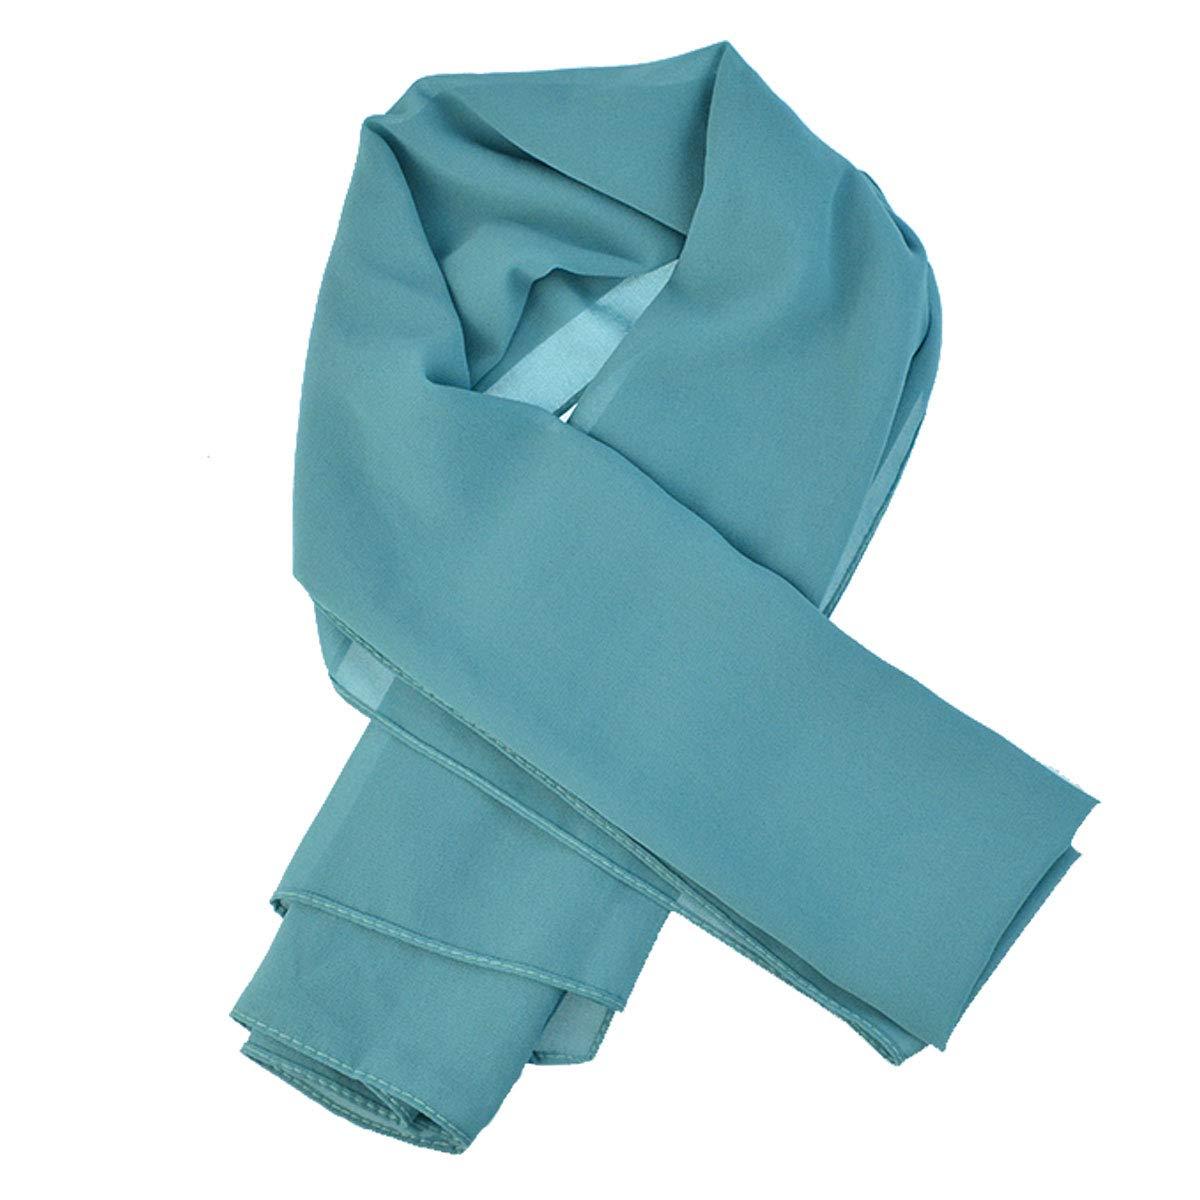 Wobe 3pcs Women Soft Chiffon Scarves Shawl Long Scarf, Travel Sunscreen Summer Beach Cover Wrap Bridal Hijab Scarf Muslin Head Scarves by Wobe (Image #4)